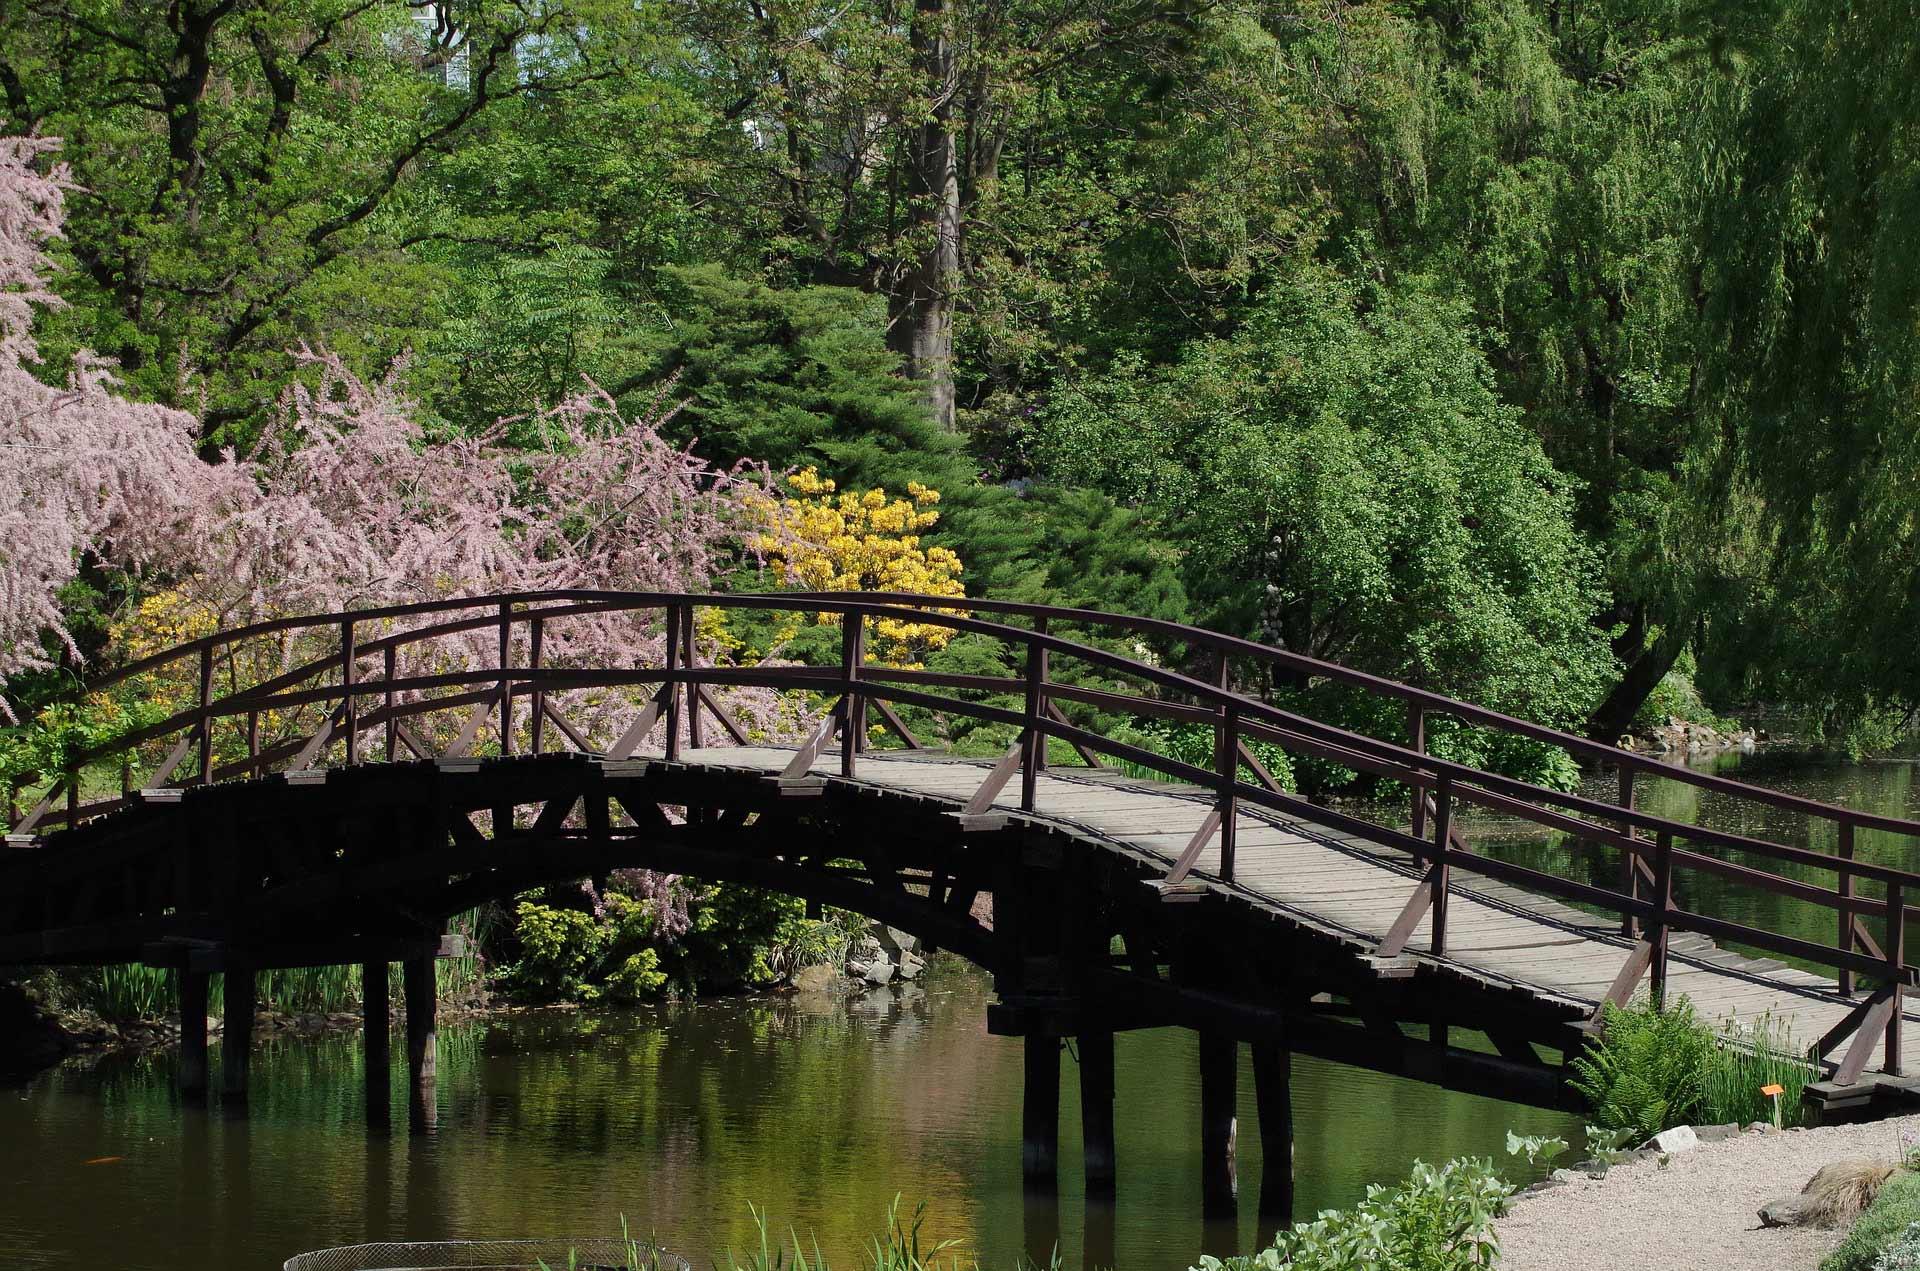 Garden Bridge Aborted Project Final Public Spend Revealed